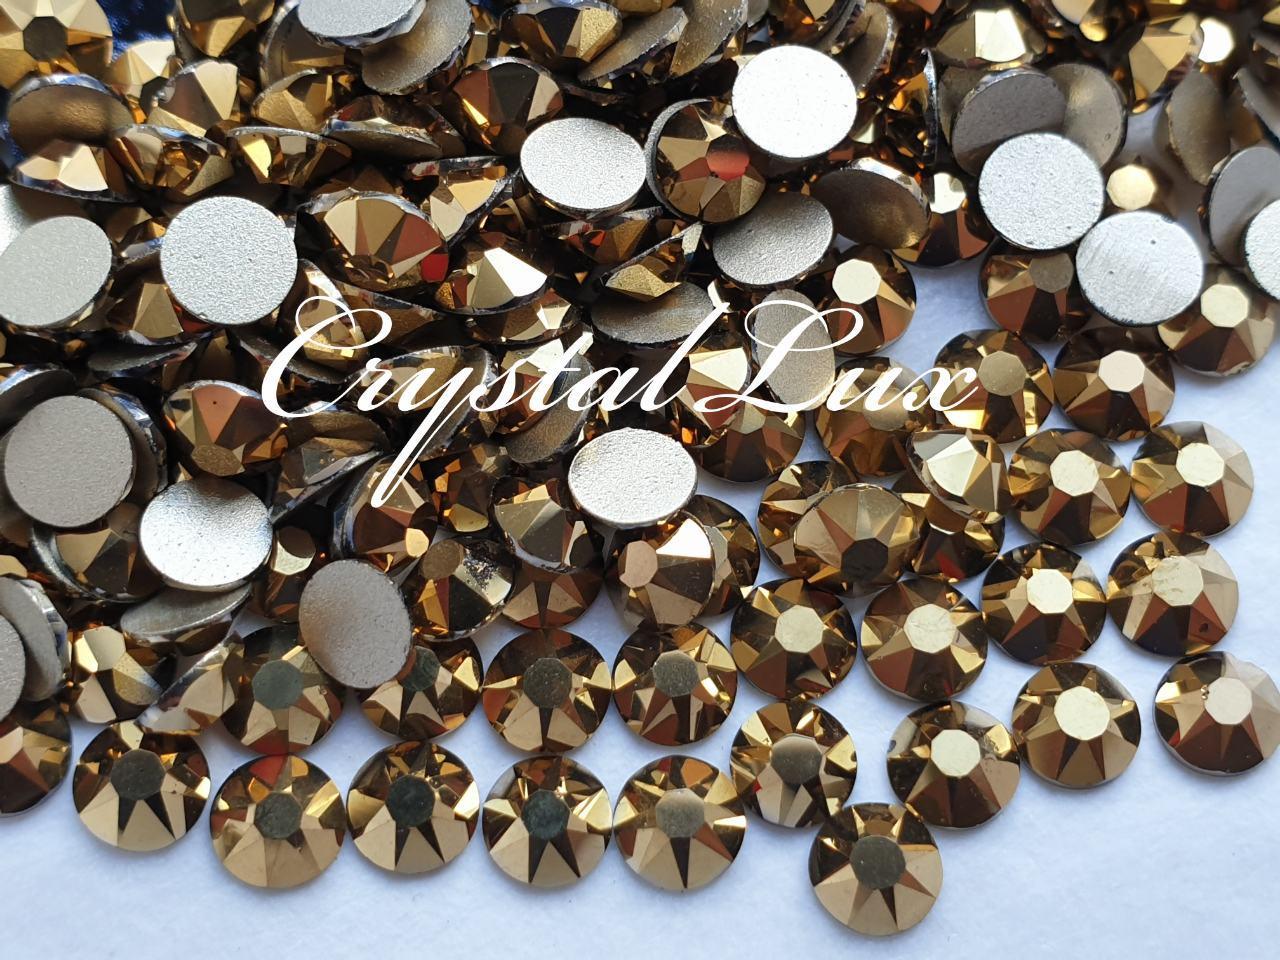 Стразы ss20 Mine Gold Xirius, NEW, 16 граней, 1440шт. (5,0мм)